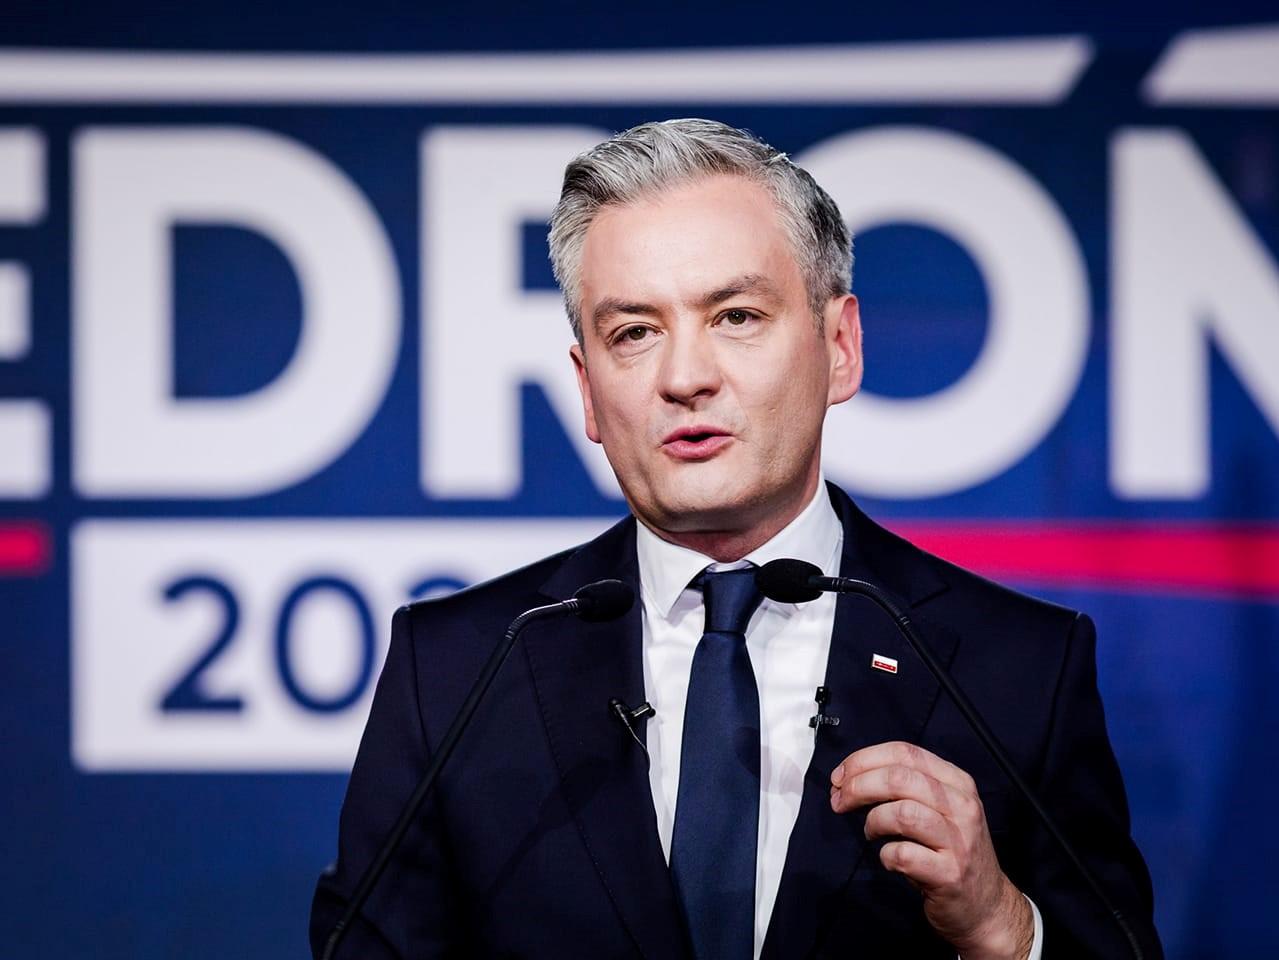 Robert Biedroń - FB: Robert Biedroń